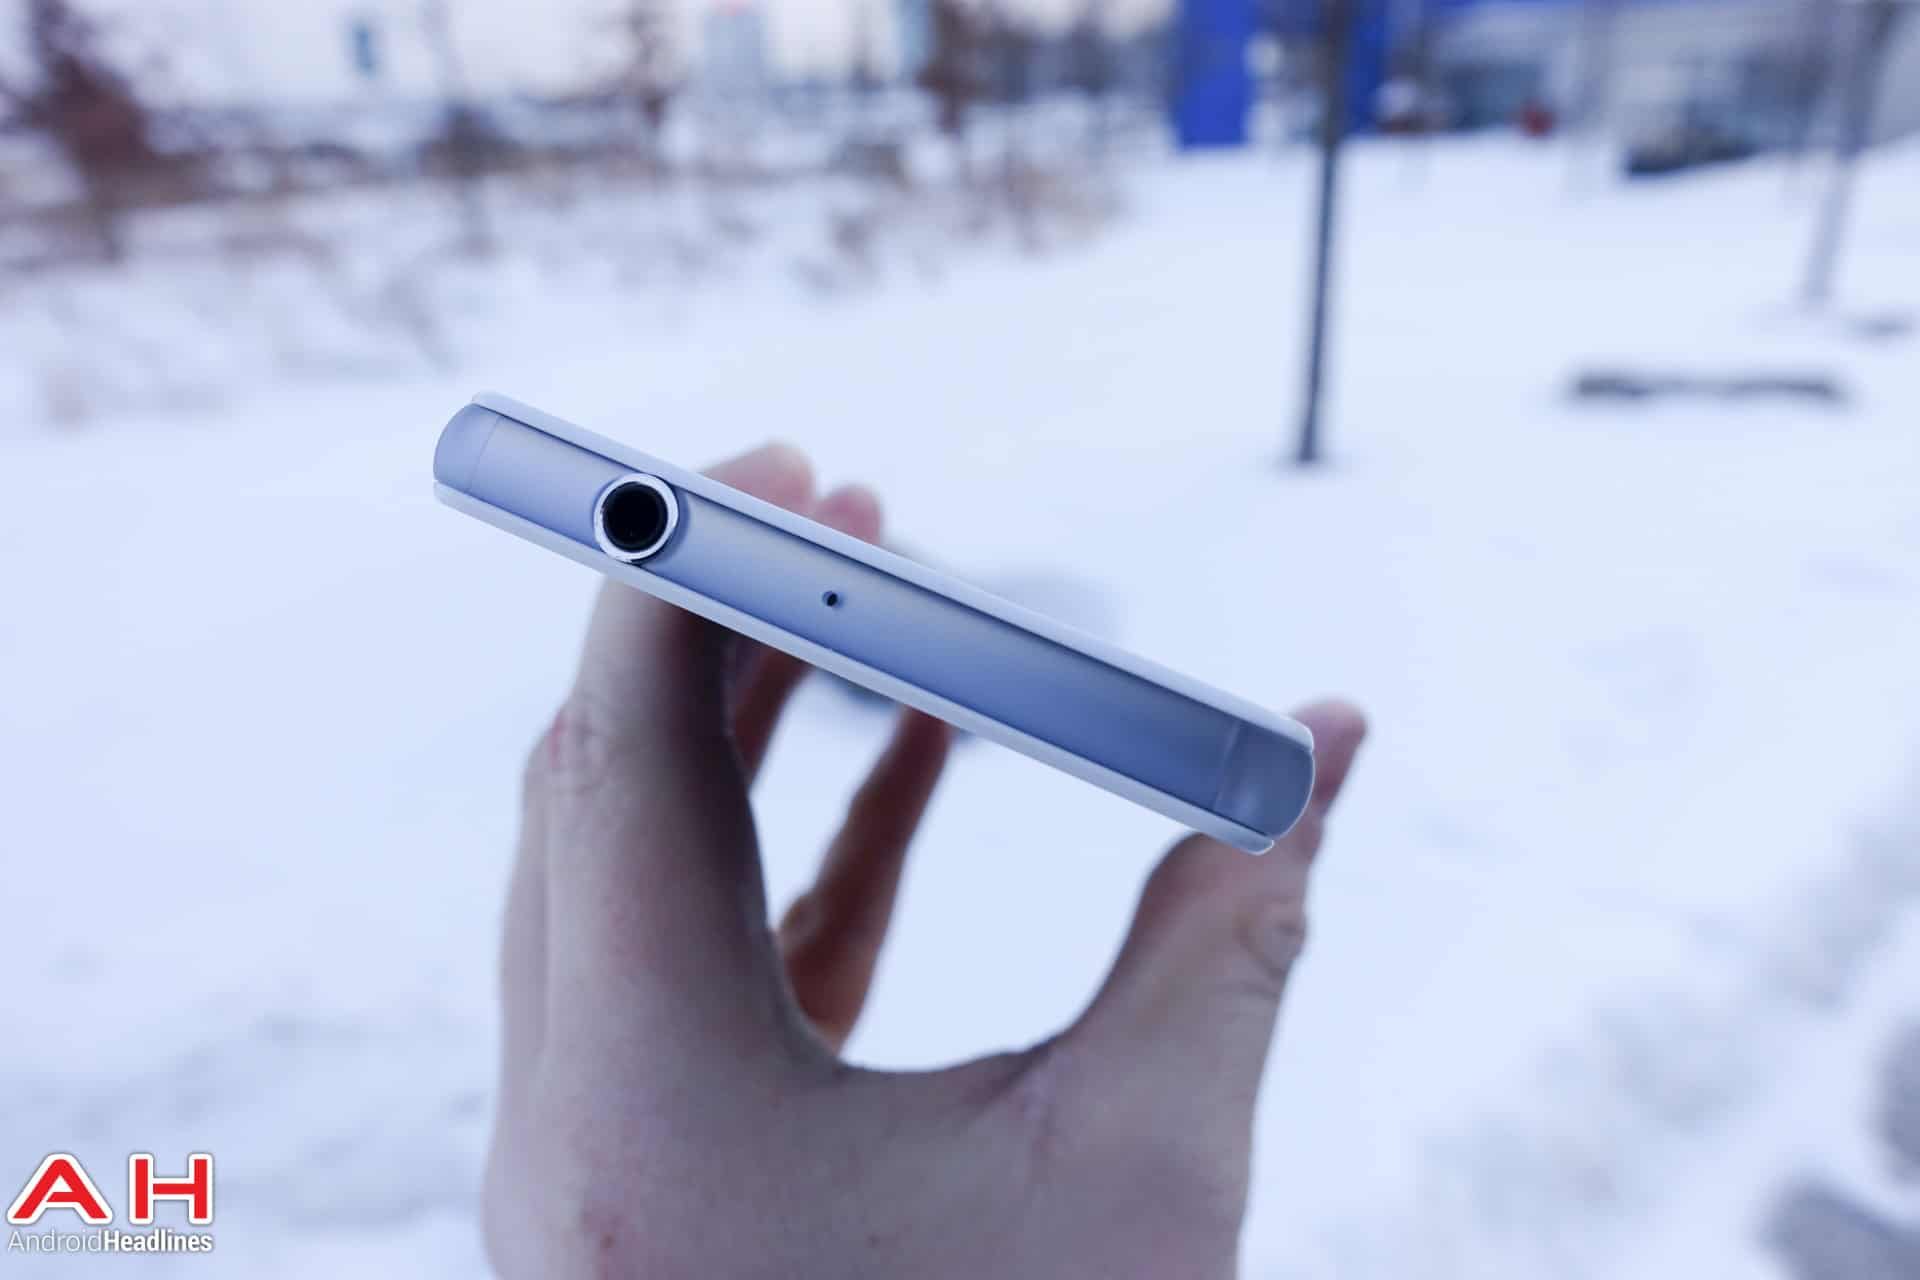 Sony-Xperia-Z3-Compact-AH-03796